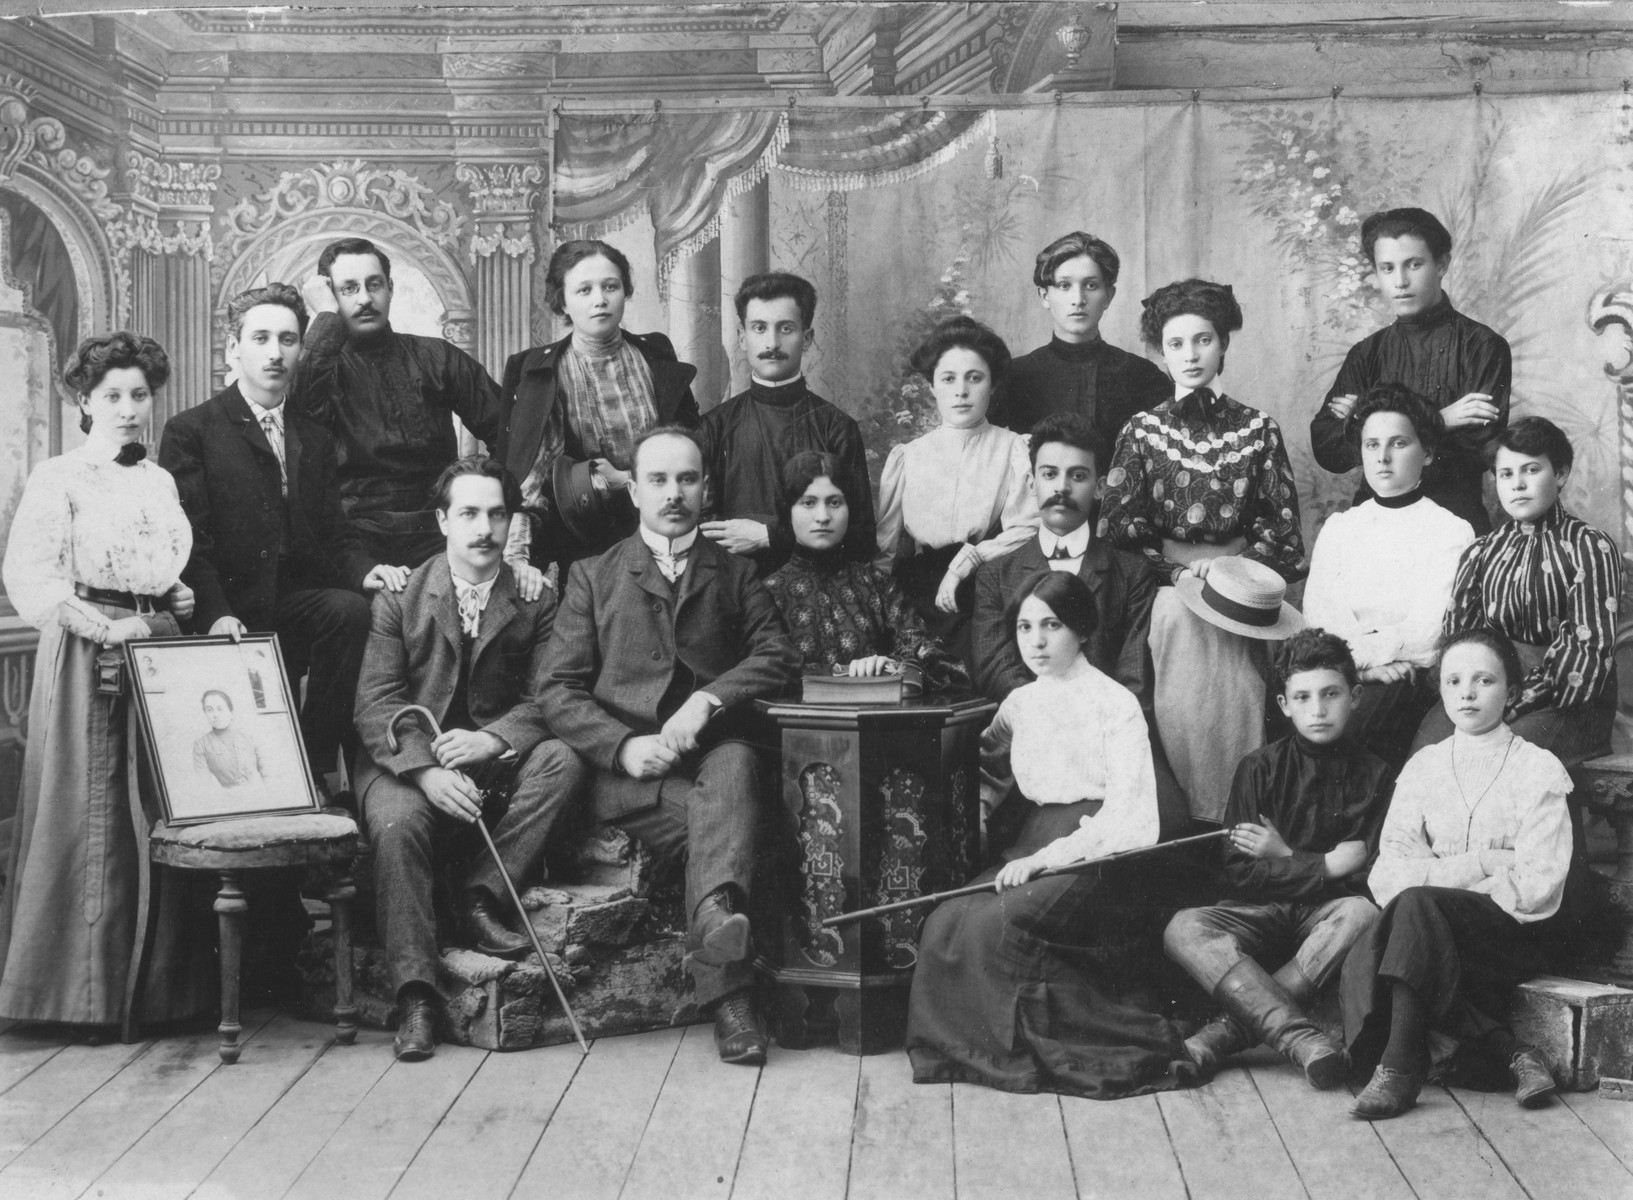 Group portrait of the Tec family in Baranovichi.